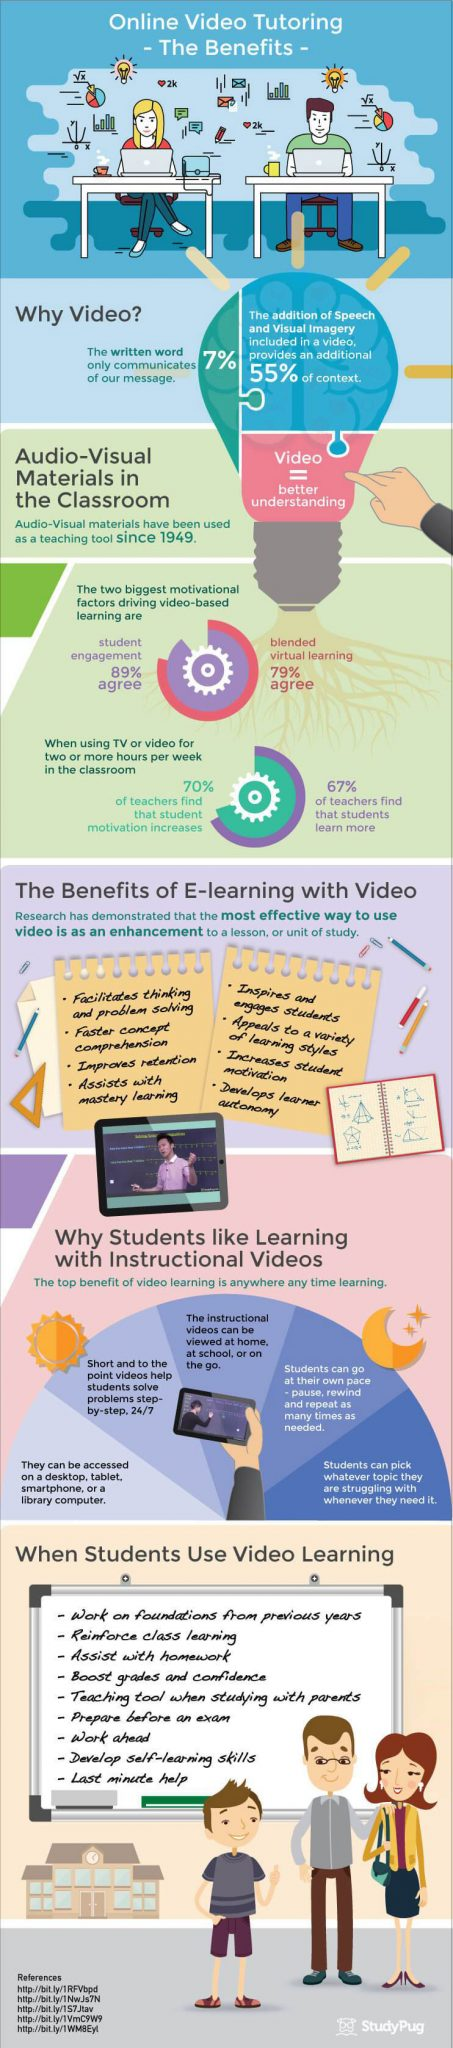 Benefits Of Online Video Tutoring - Infographic